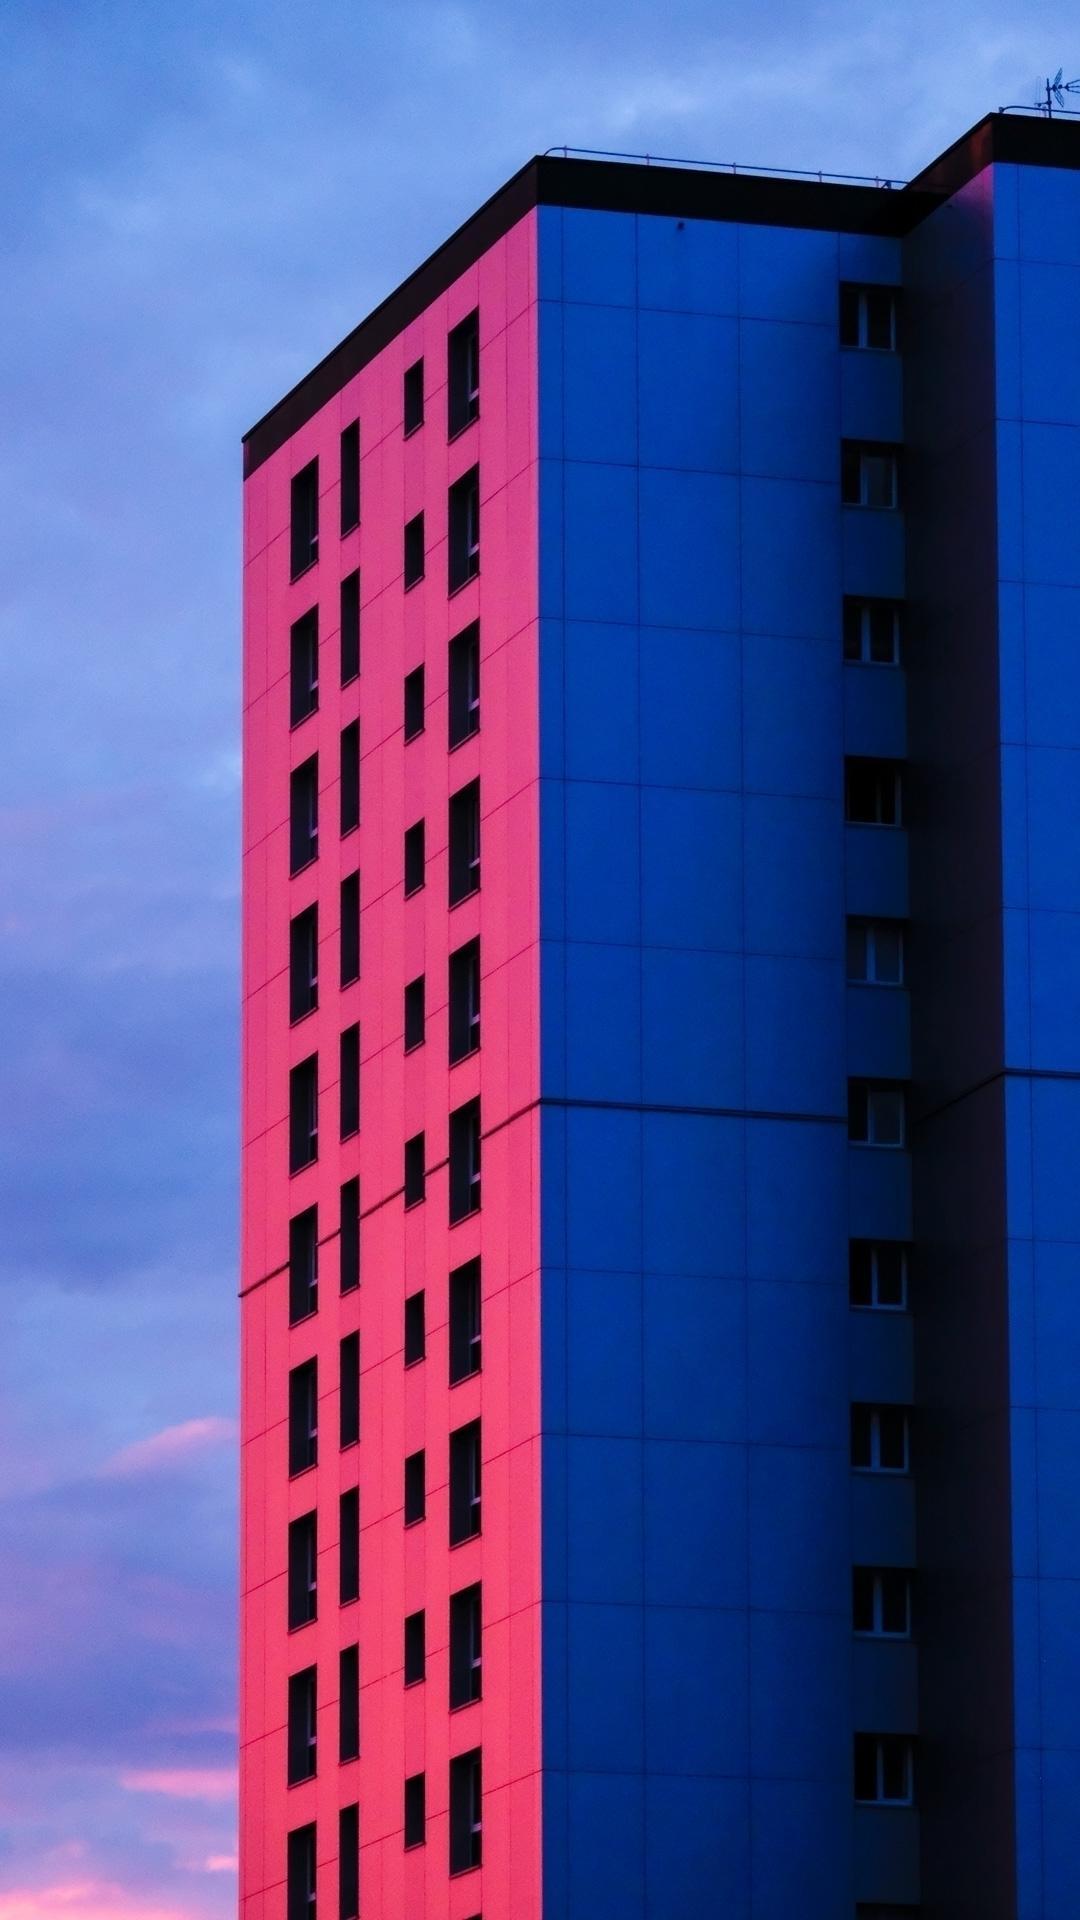 47°12'34.4N 1°31'48.9W - architecture - etng | ello